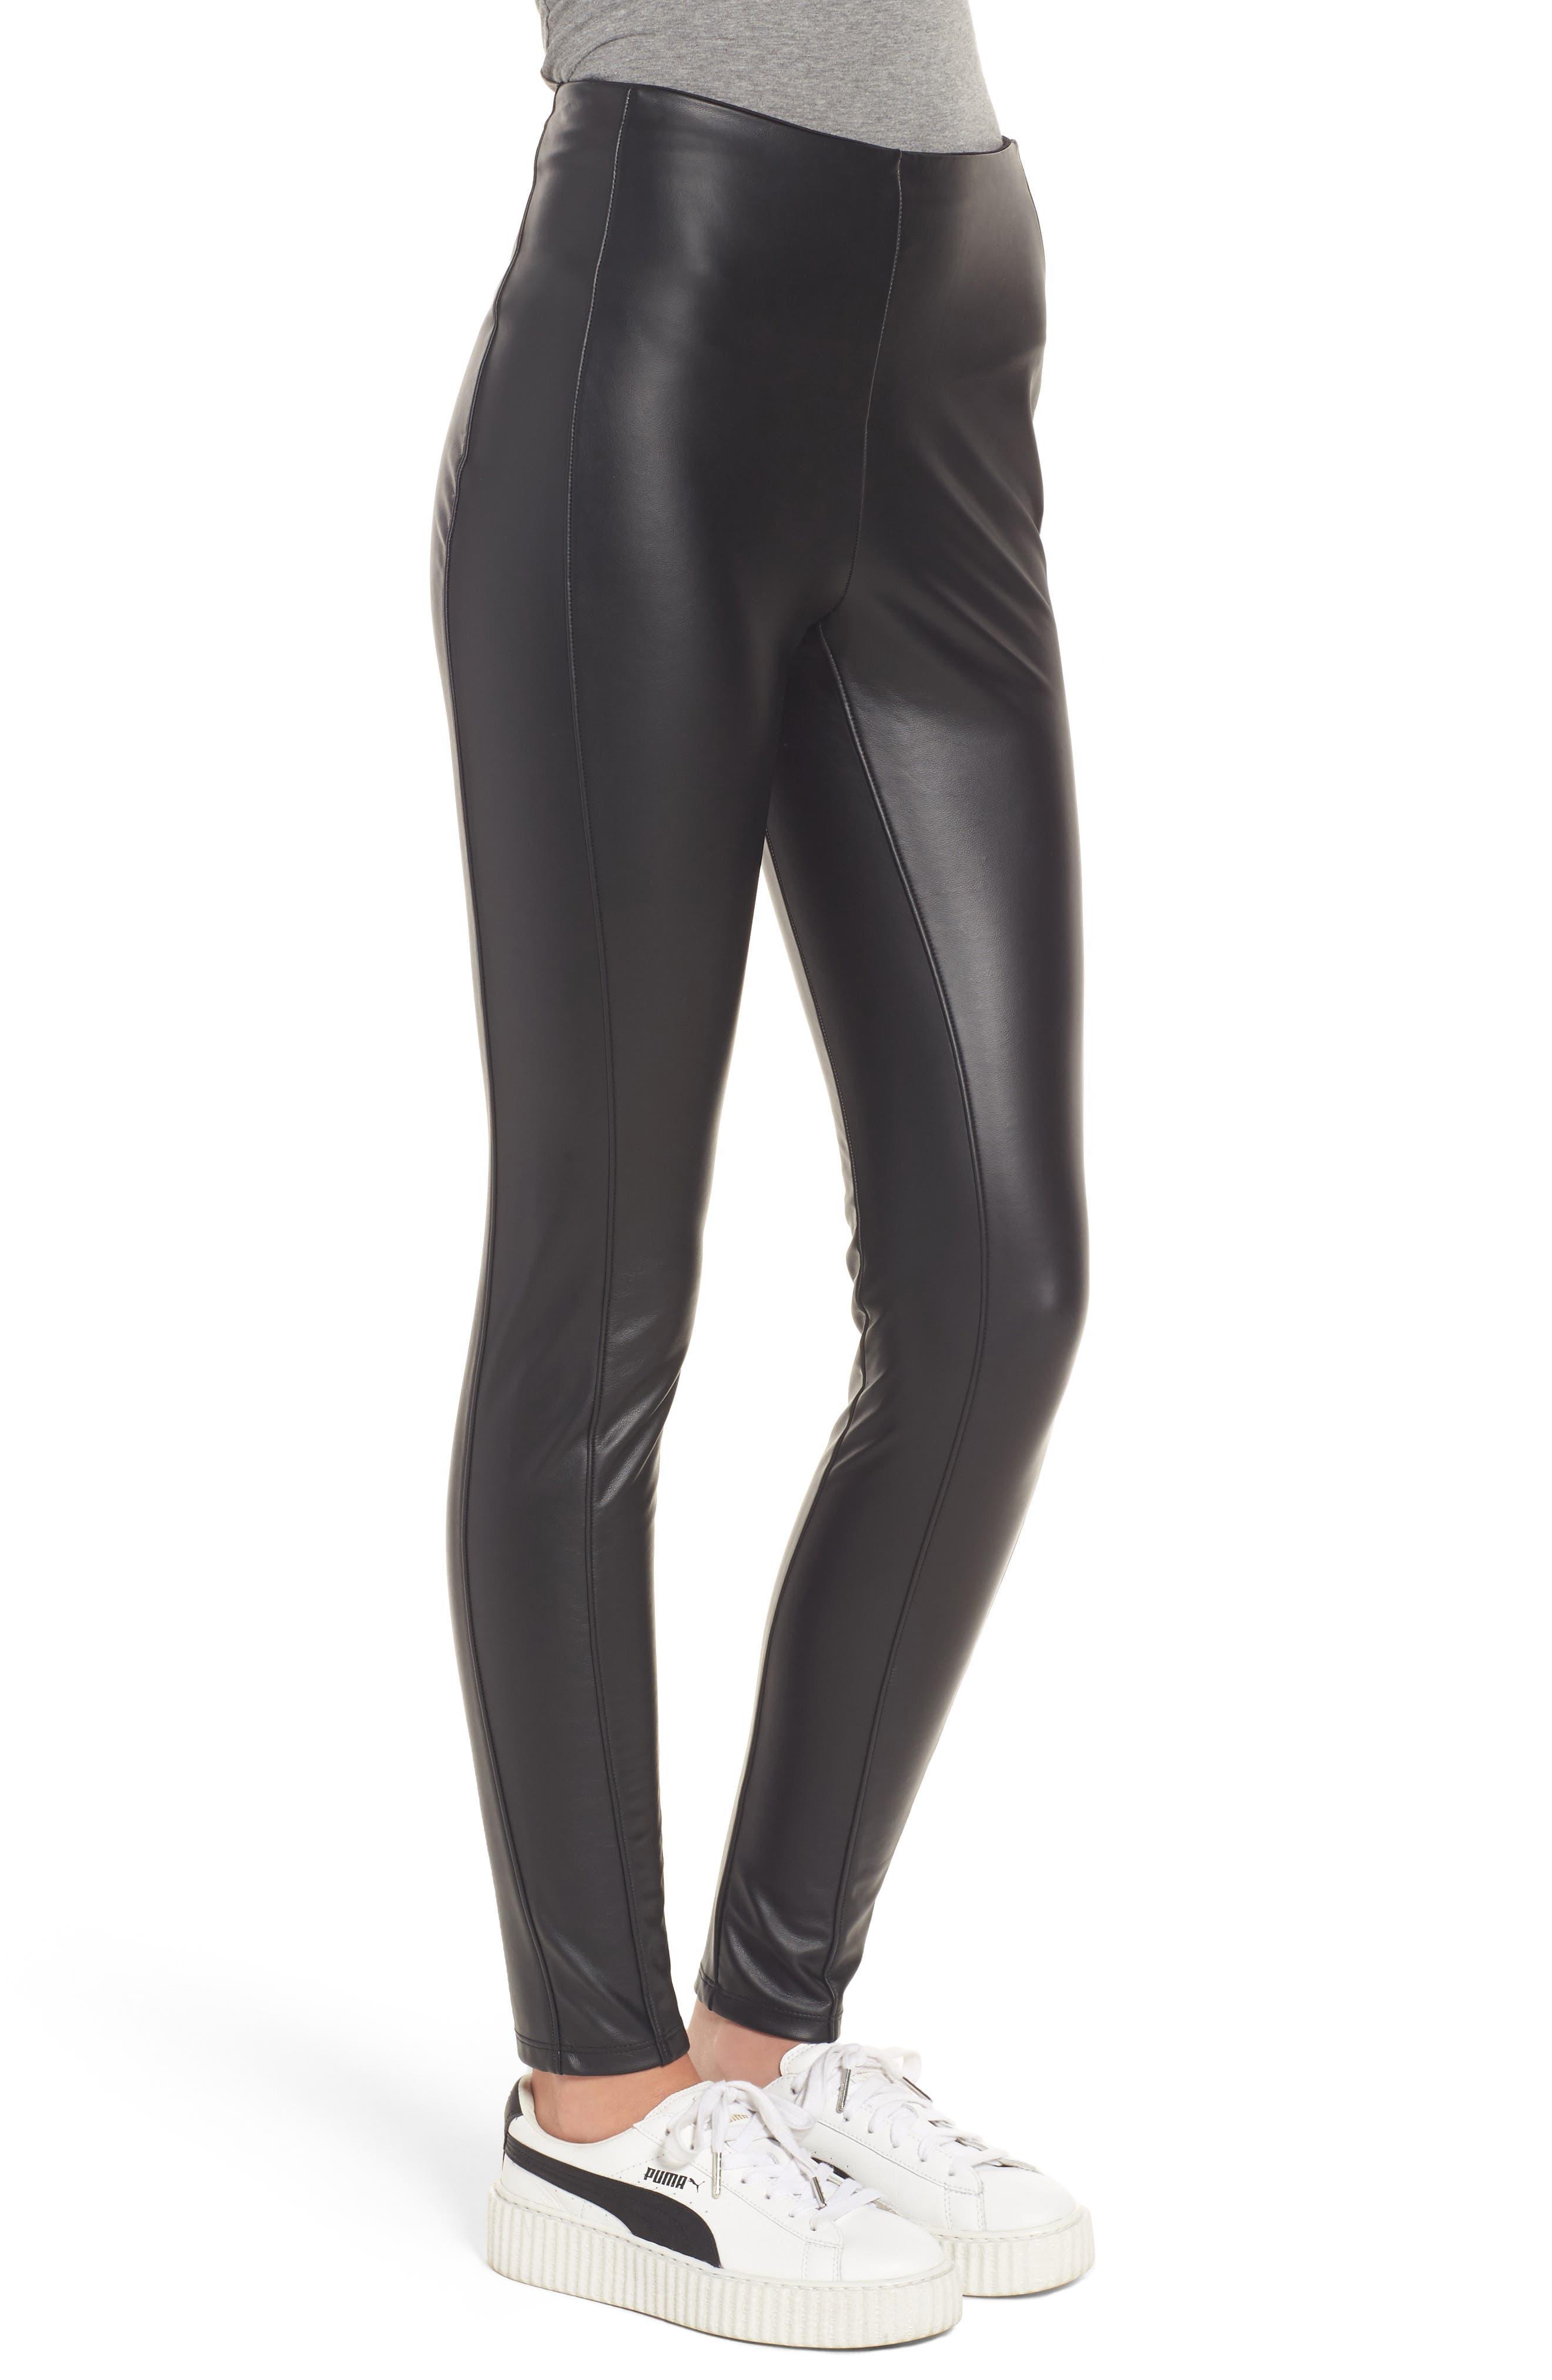 Bryce High Waist Faux Leather Leggings,                             Alternate thumbnail 3, color,                             Black